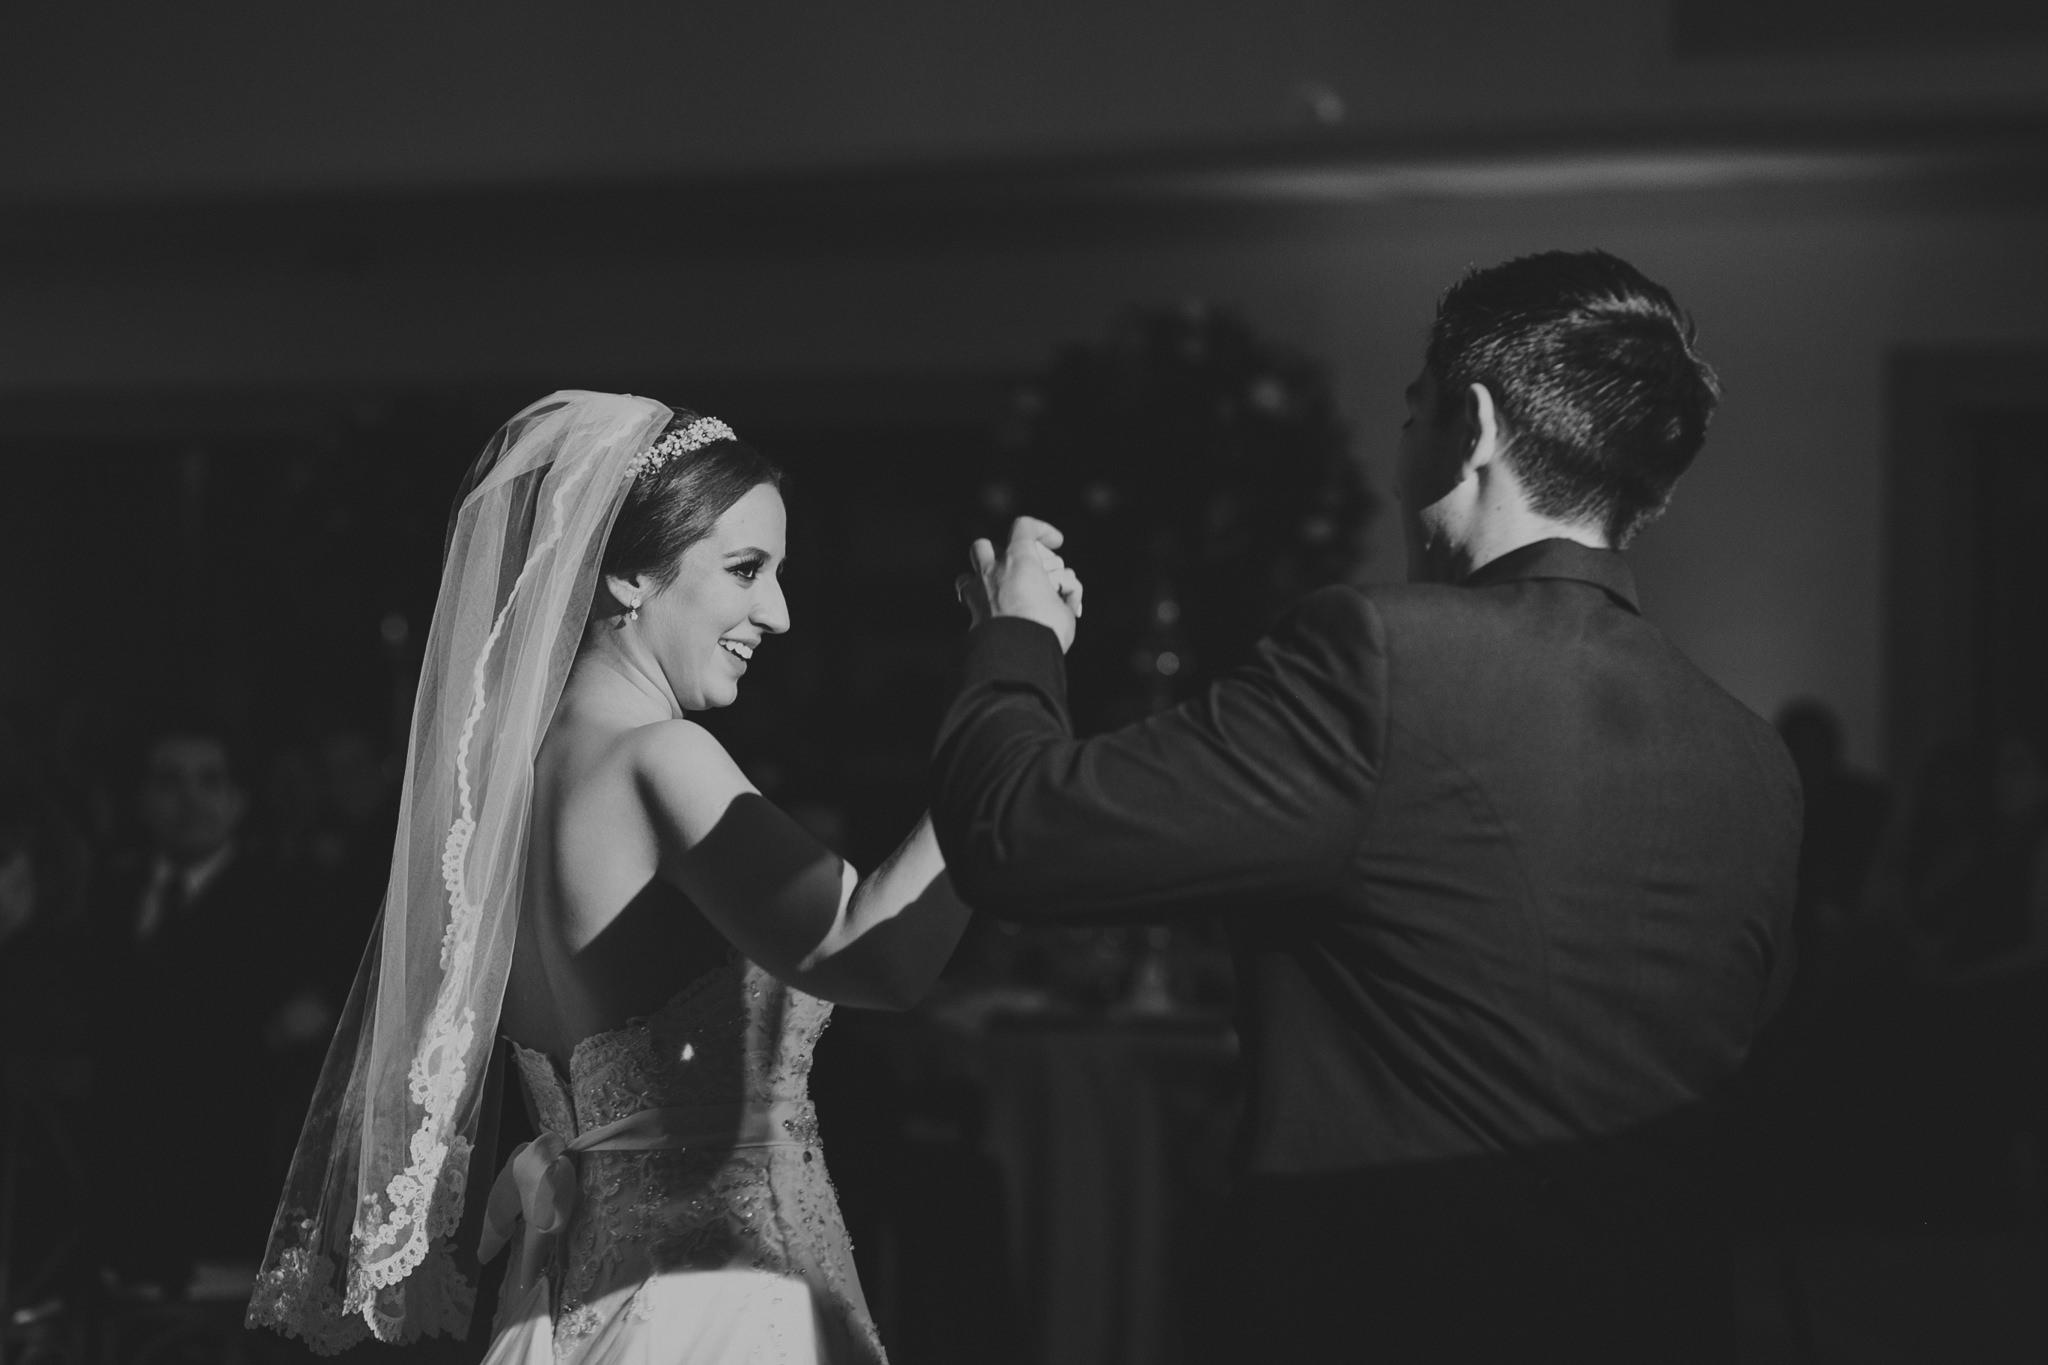 boda-en-torreon-armando-aragon-27